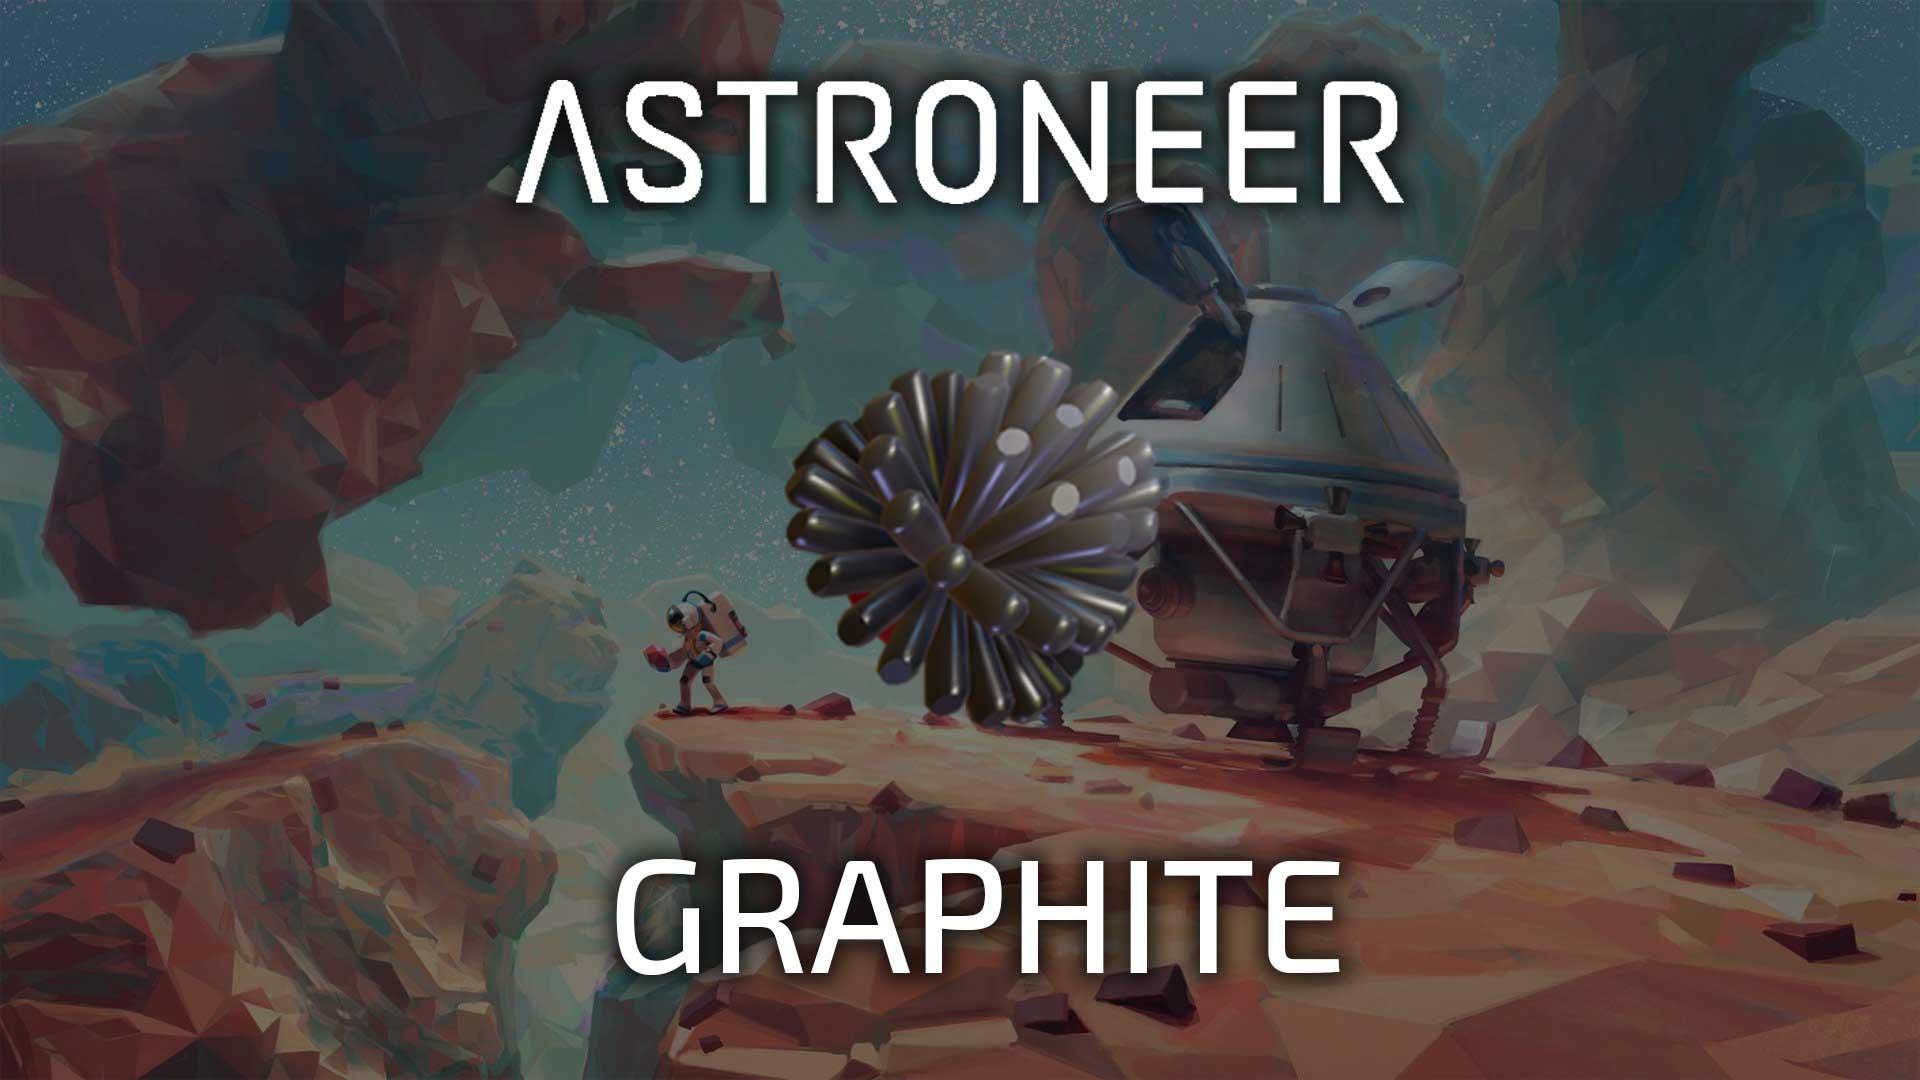 Astroneer graphite